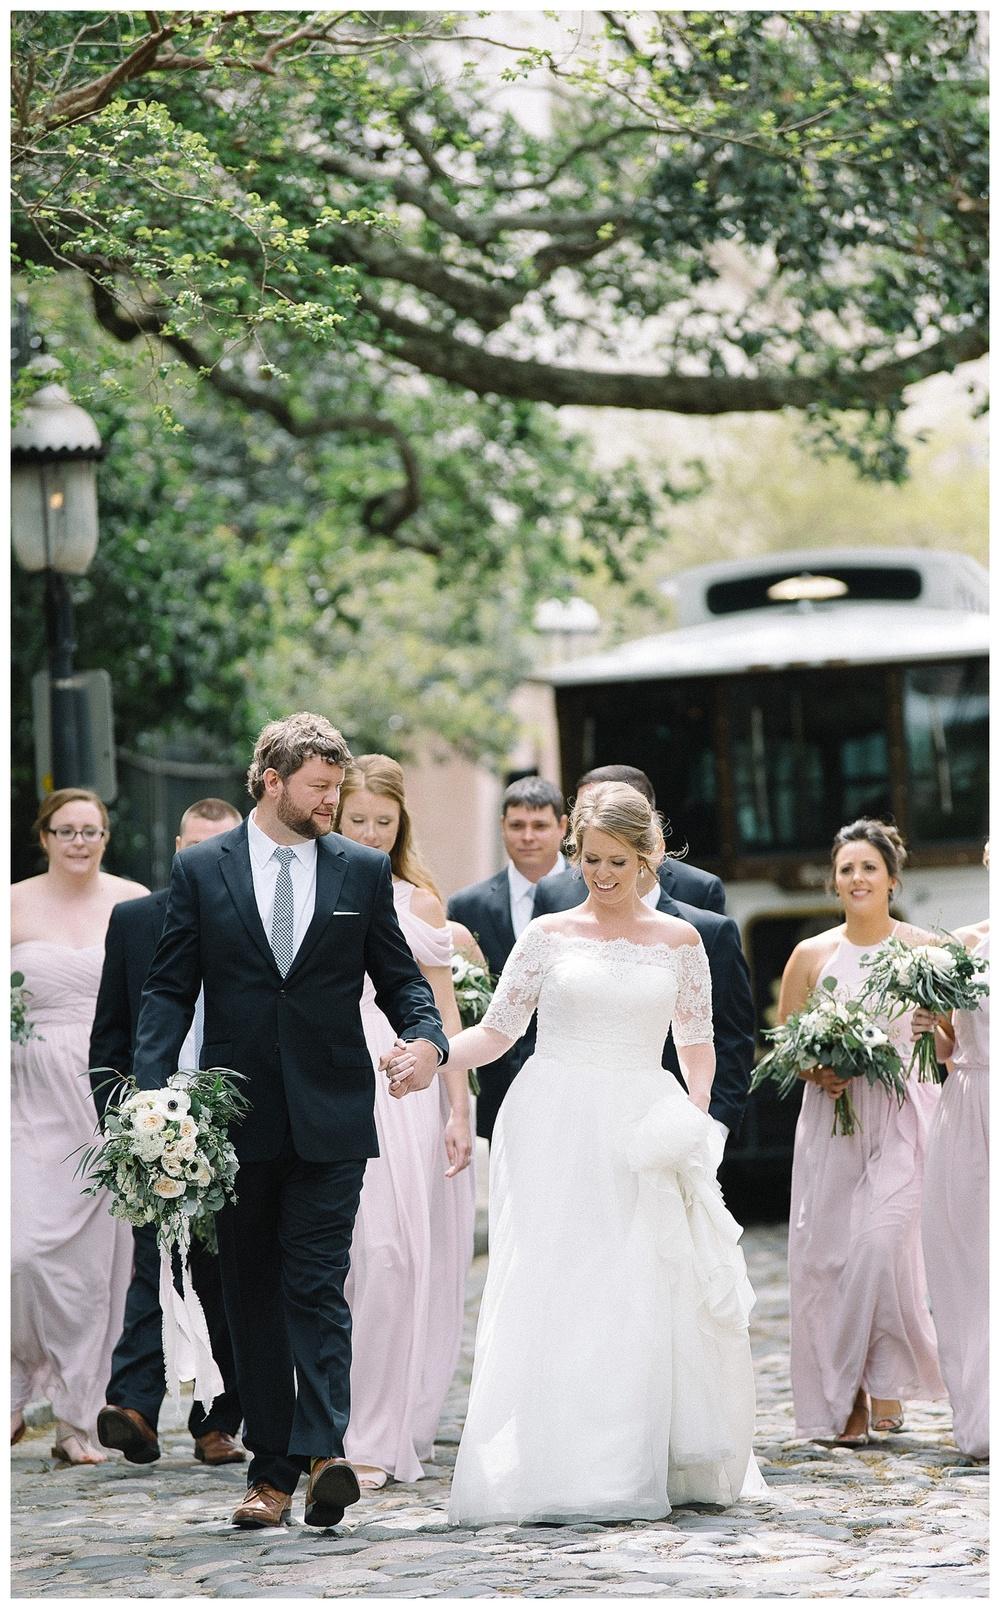 Club Creek Ion Wedding Photos_sMm Photography-50.jpg